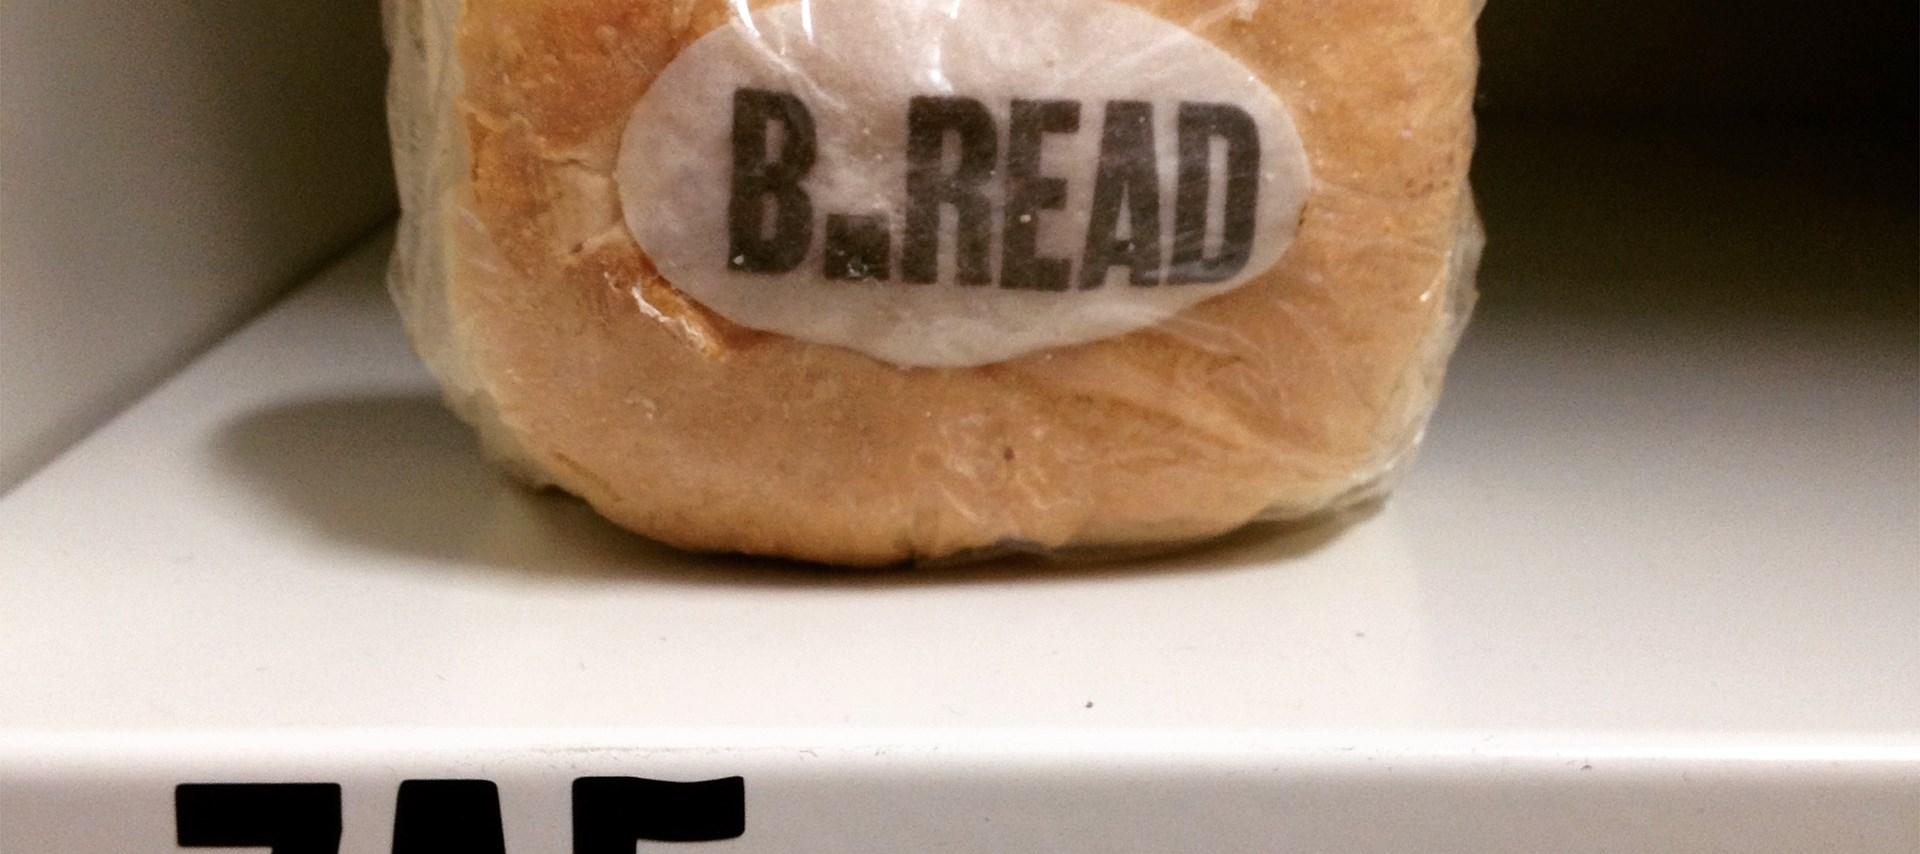 B.Read Bun in Archive